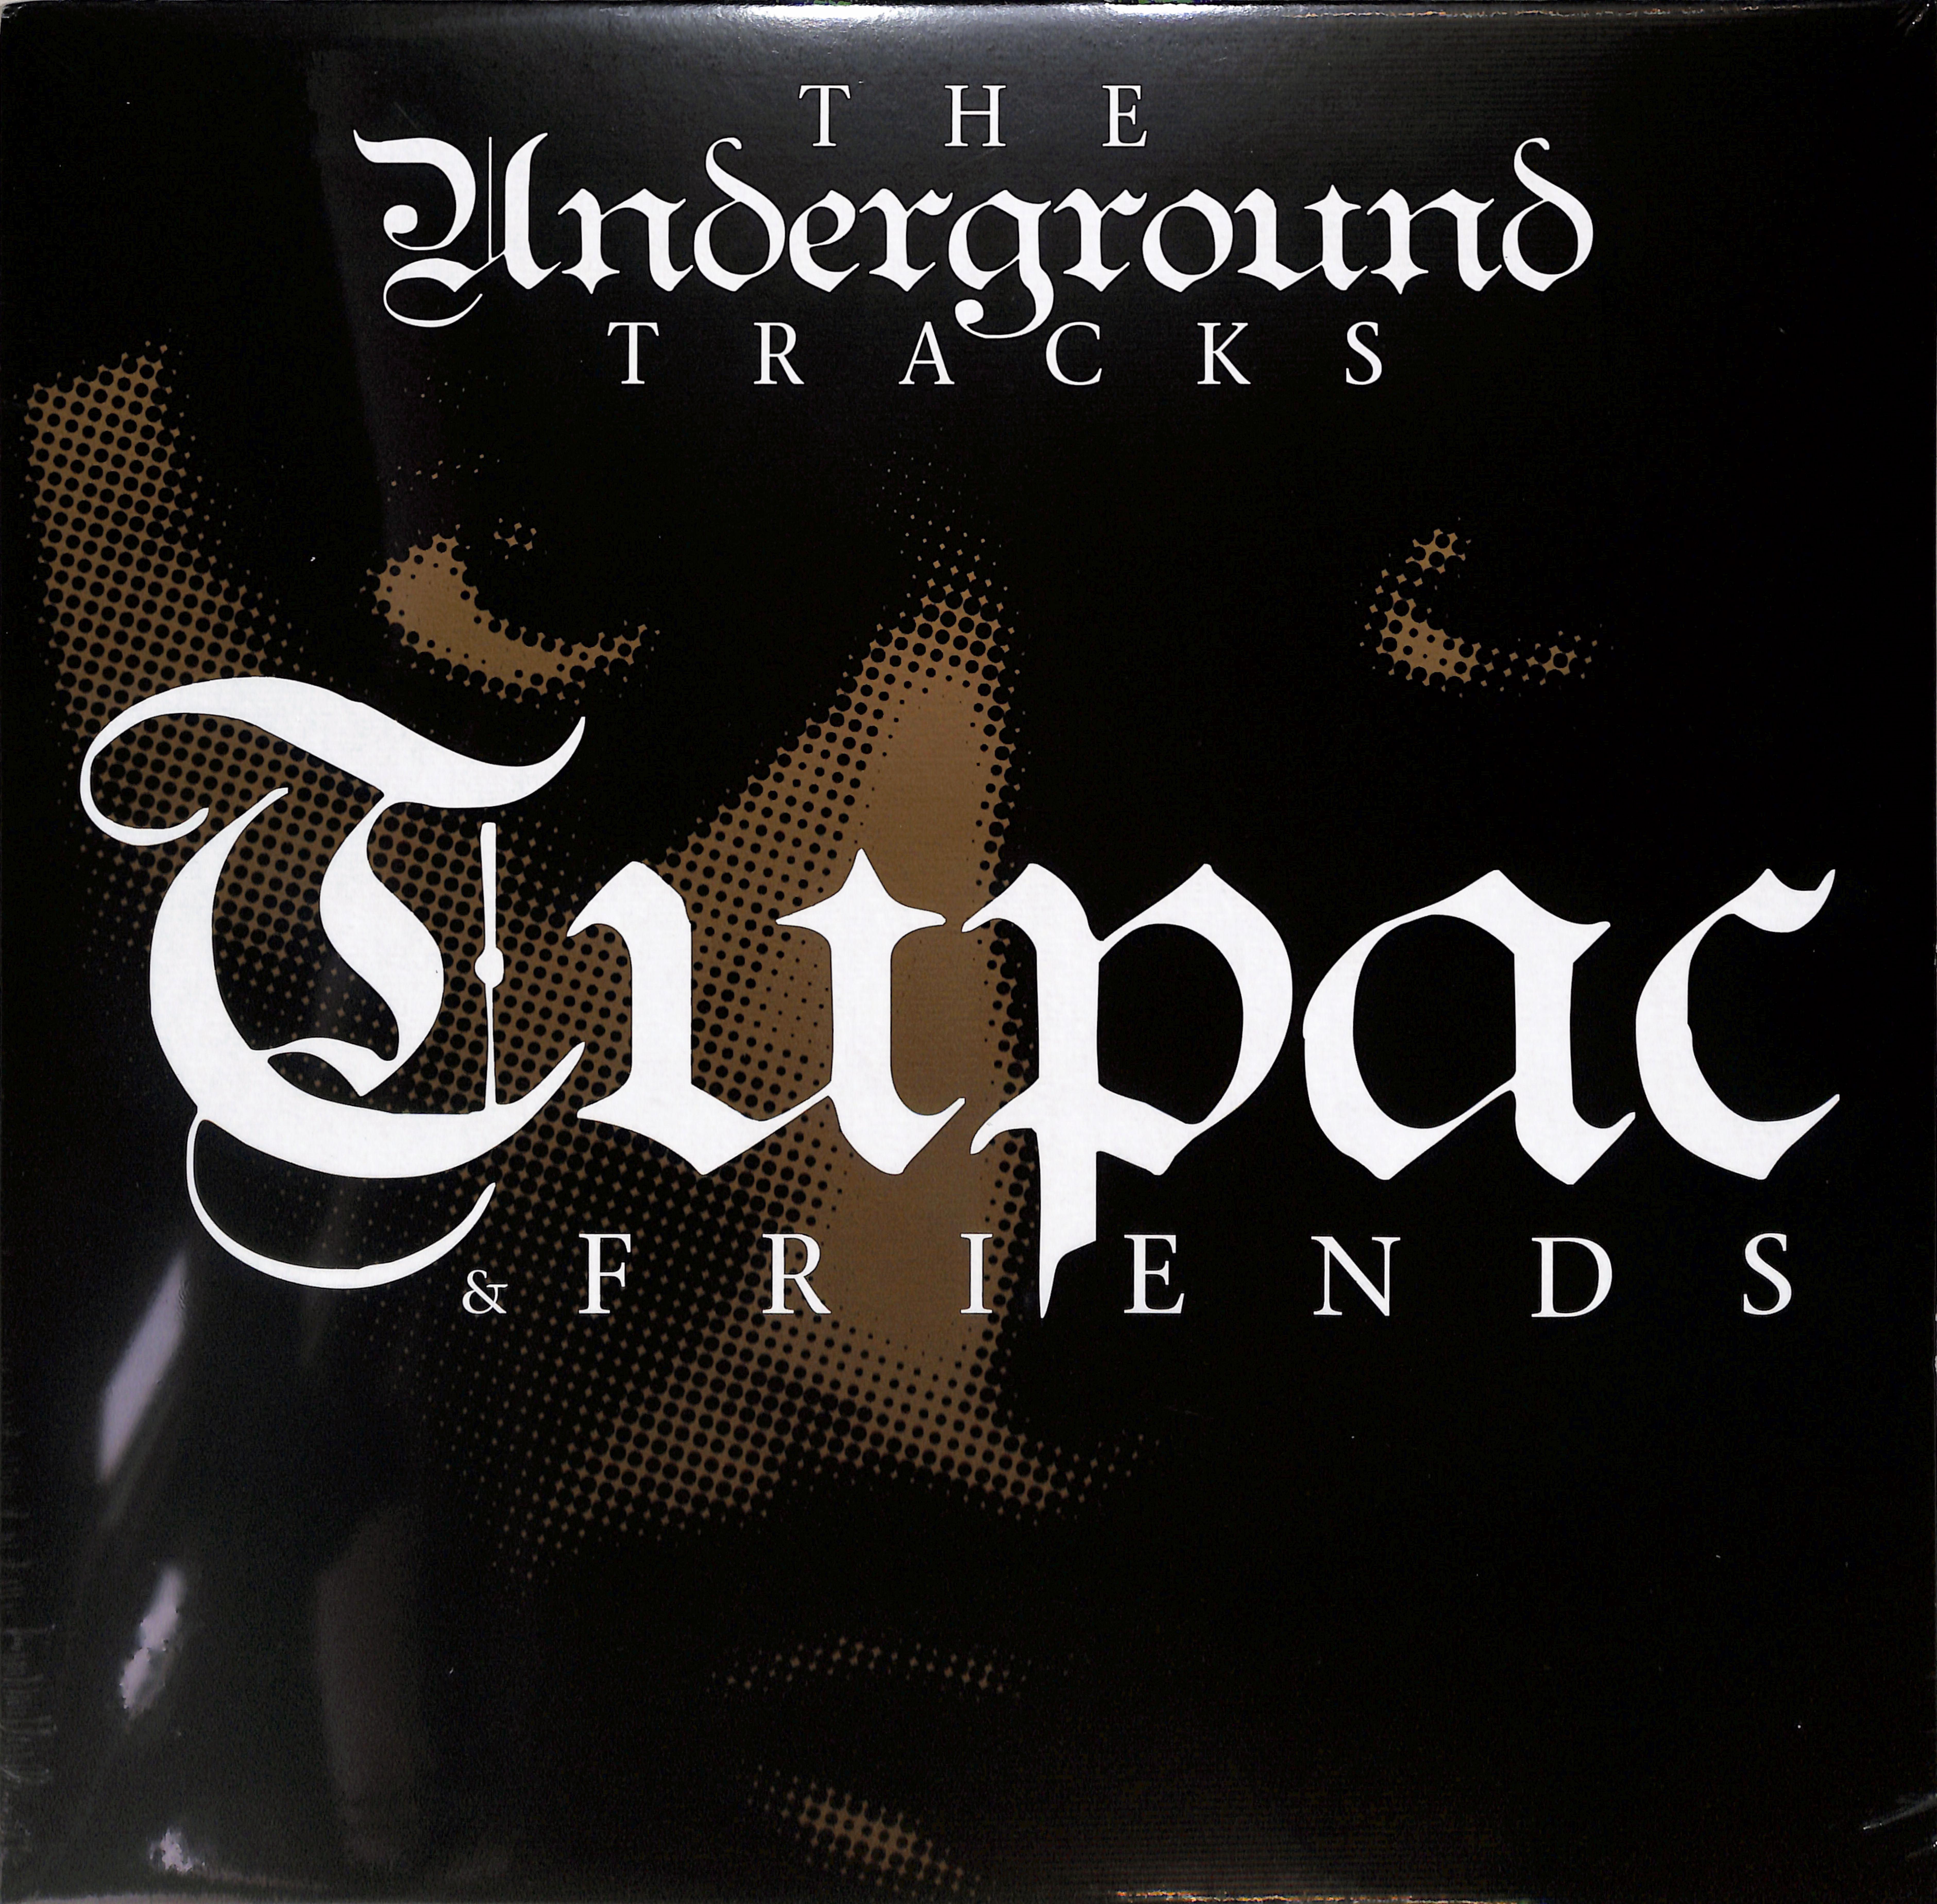 Tupac & Friends - THE UNDERGROUND TRACKS